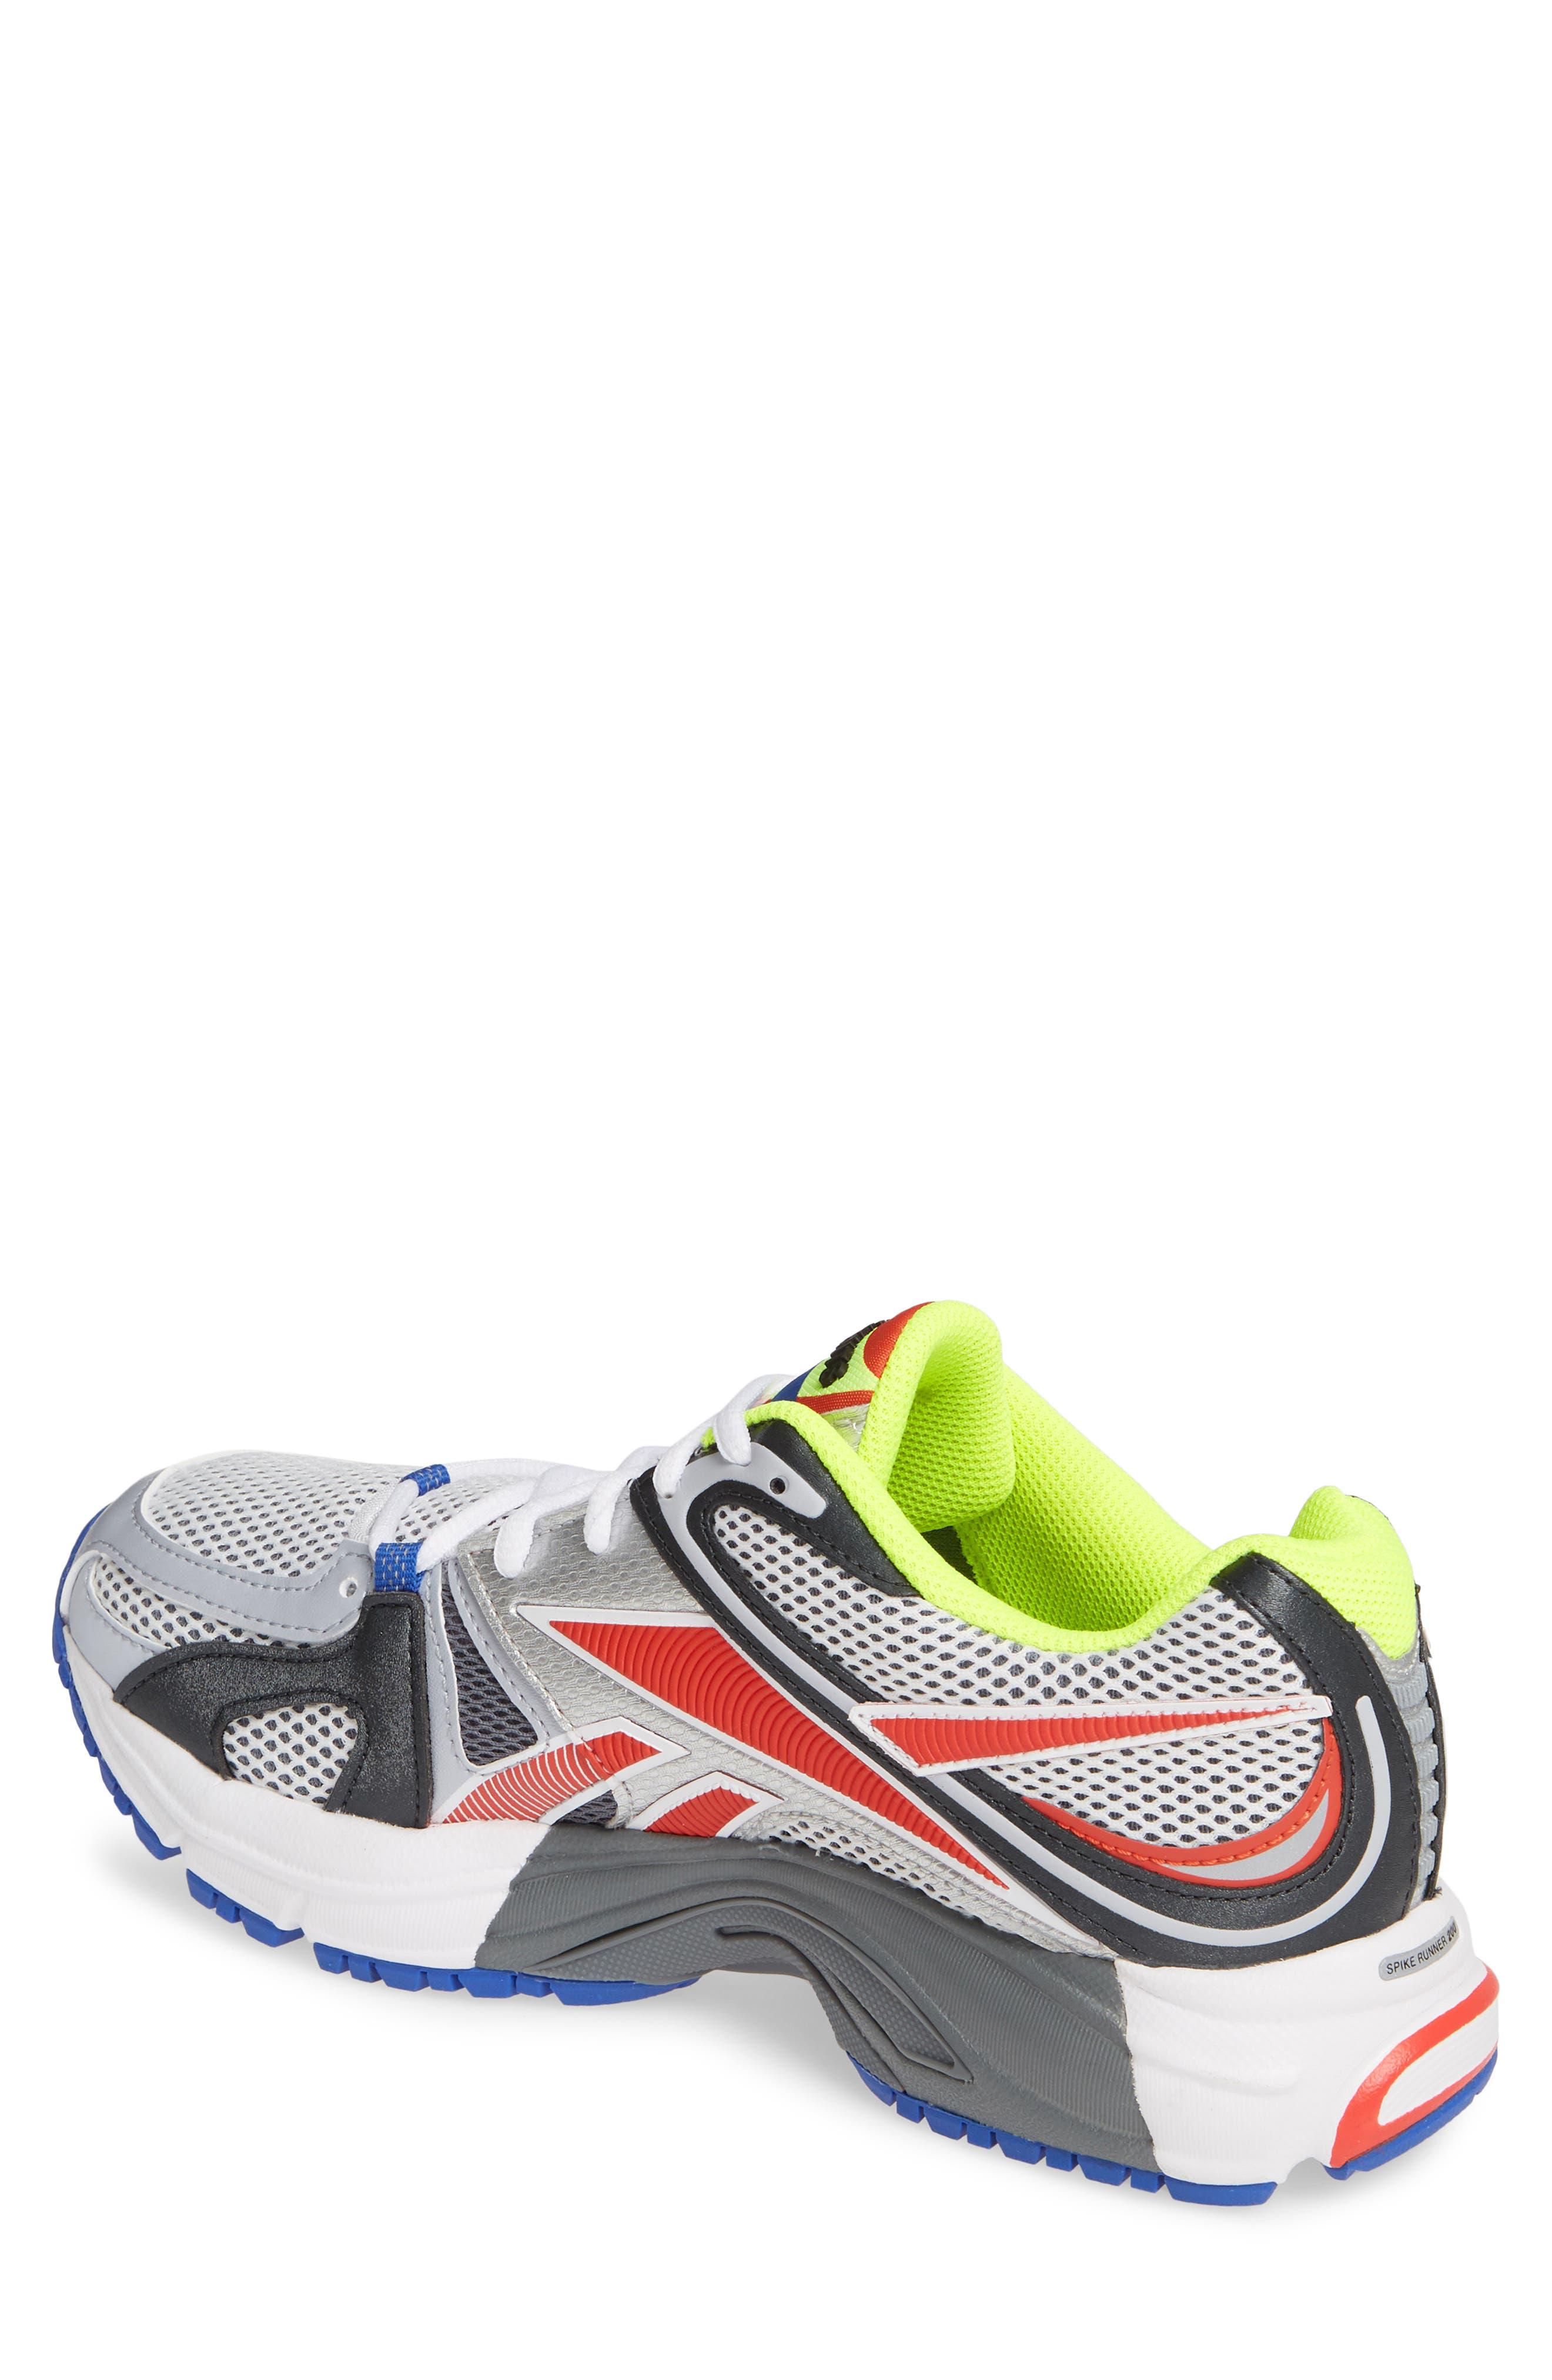 VETEMENTS, x Reebok Spike Runner 200 Sneaker, Alternate thumbnail 2, color, FLUO YELLOW